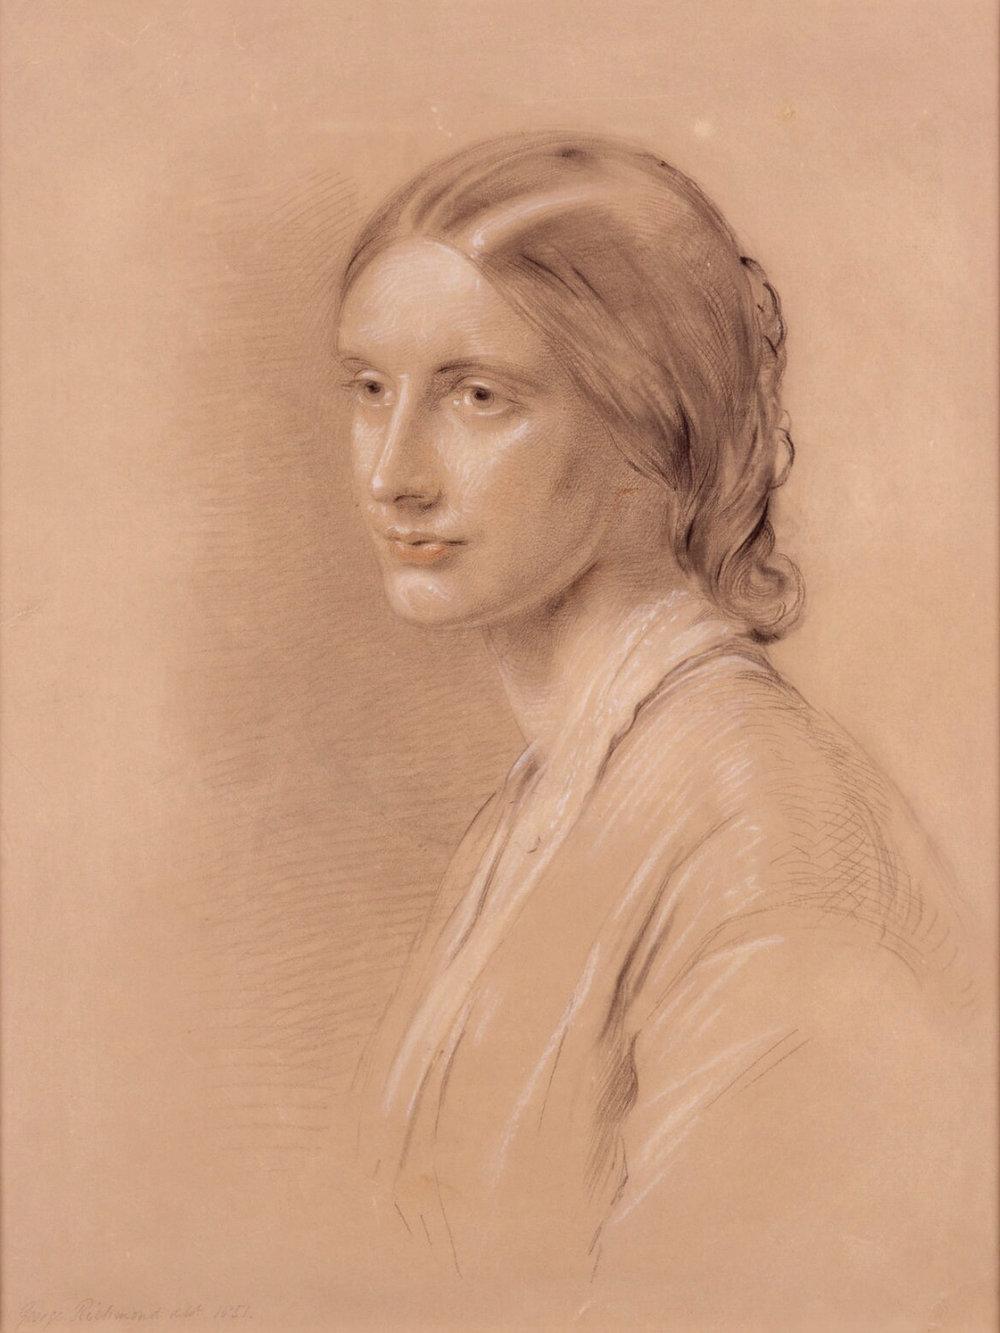 Portrait of Josephine Butler by George Richmond, 1851  (NPG/Wikimedia Commons/Public Domain)